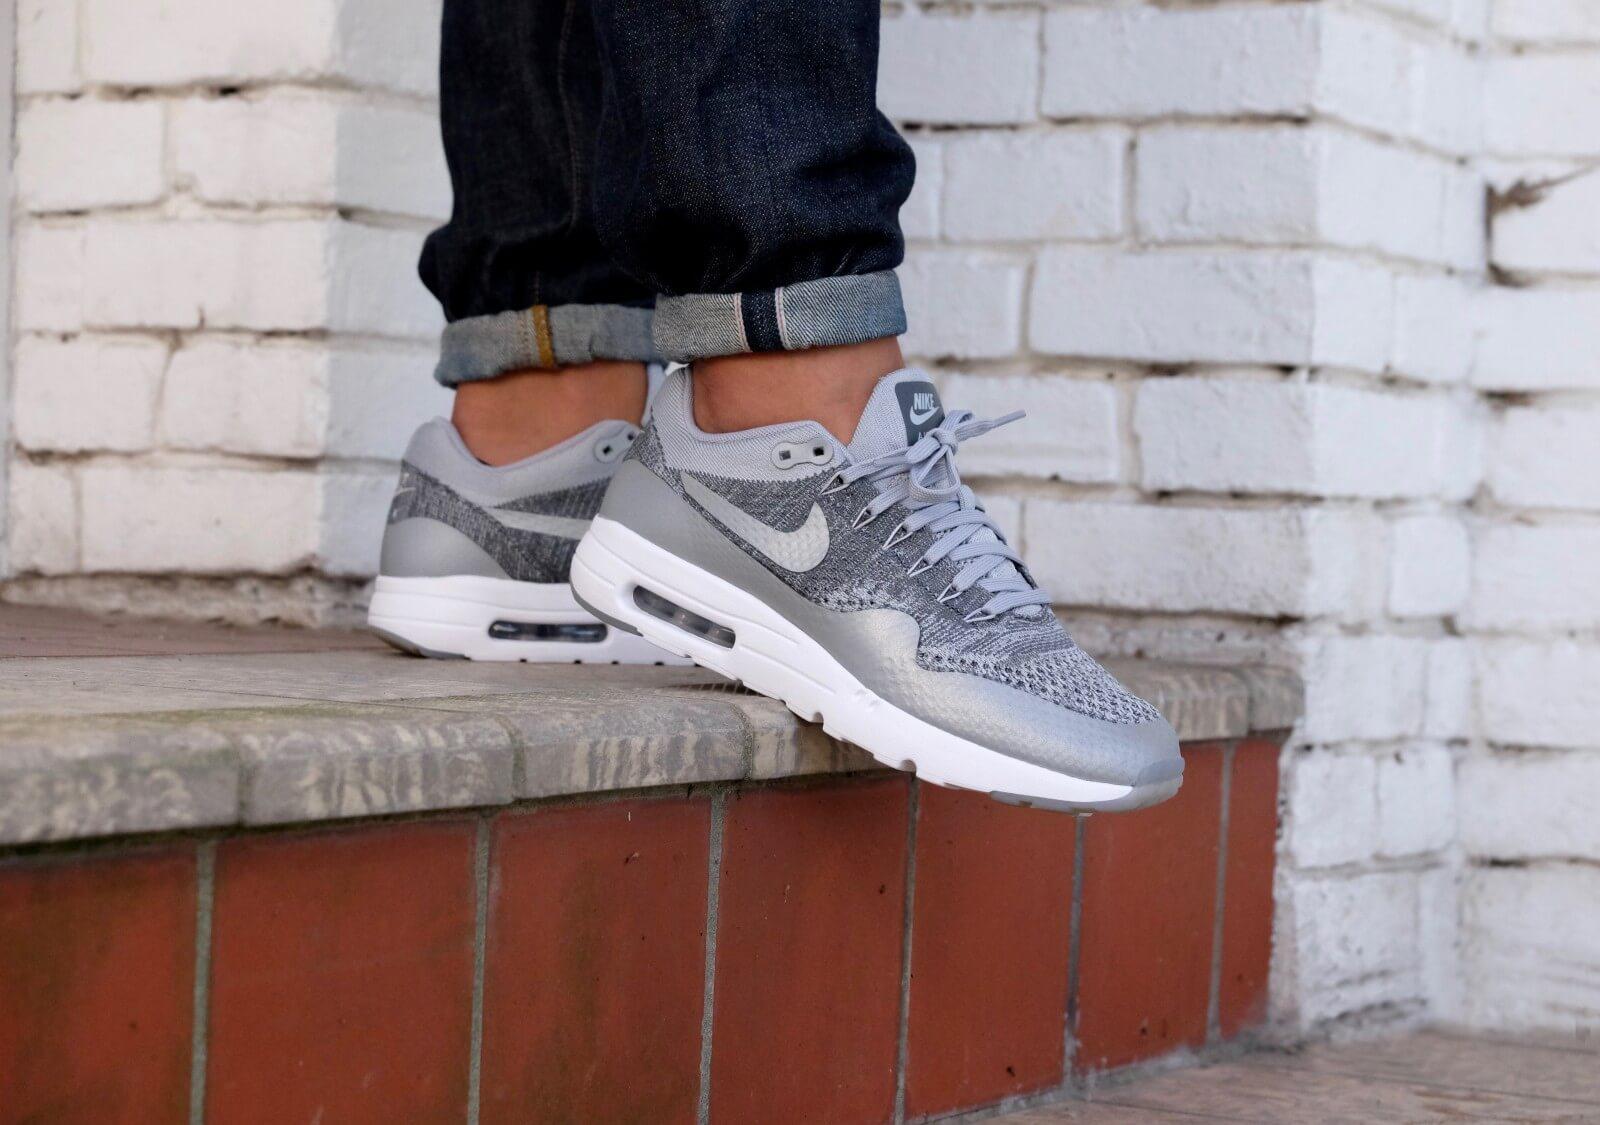 Air Max 1 Ultra Flyknit 'Wolf Grey' Nike 843384 001 | GOAT